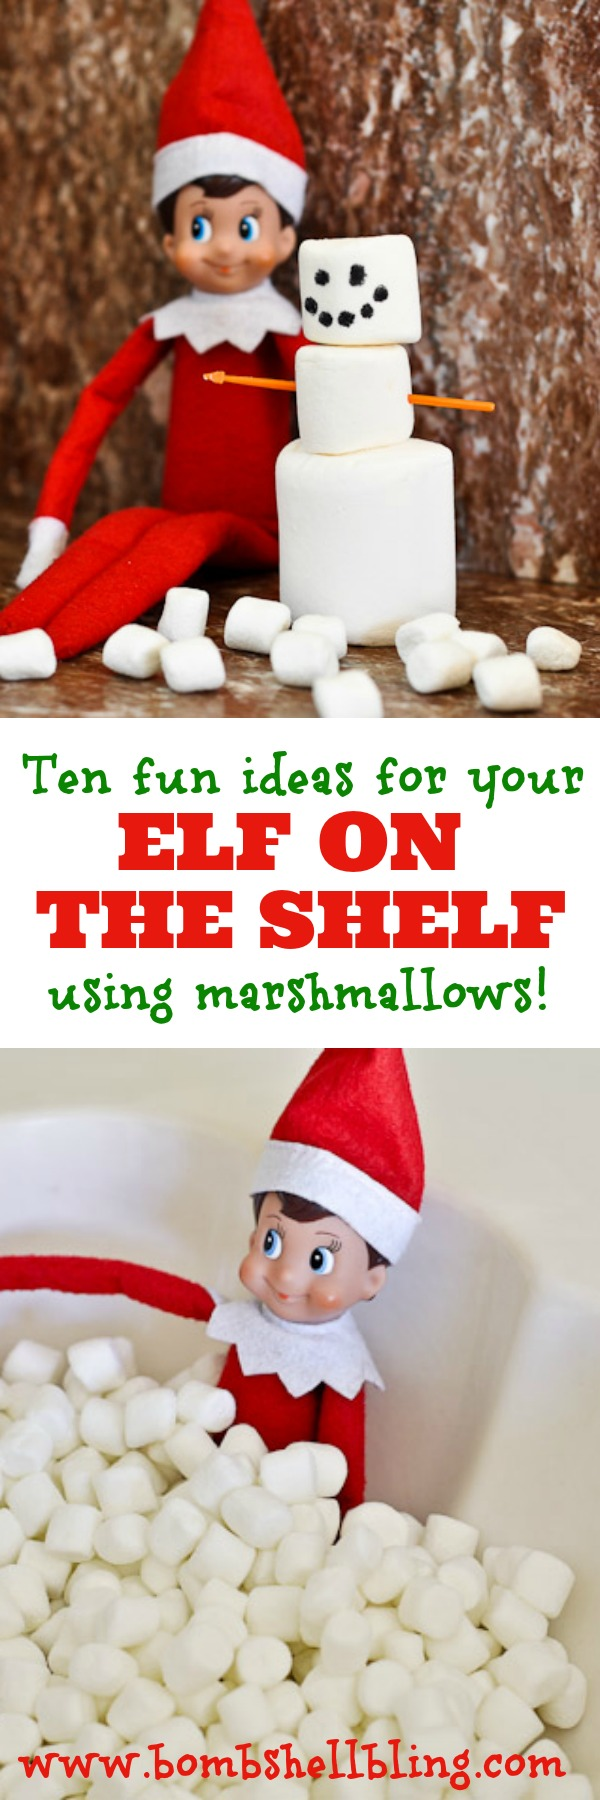 Decor to adore november 2013 - Elf On The Shelf Ideas Using Marshmallows